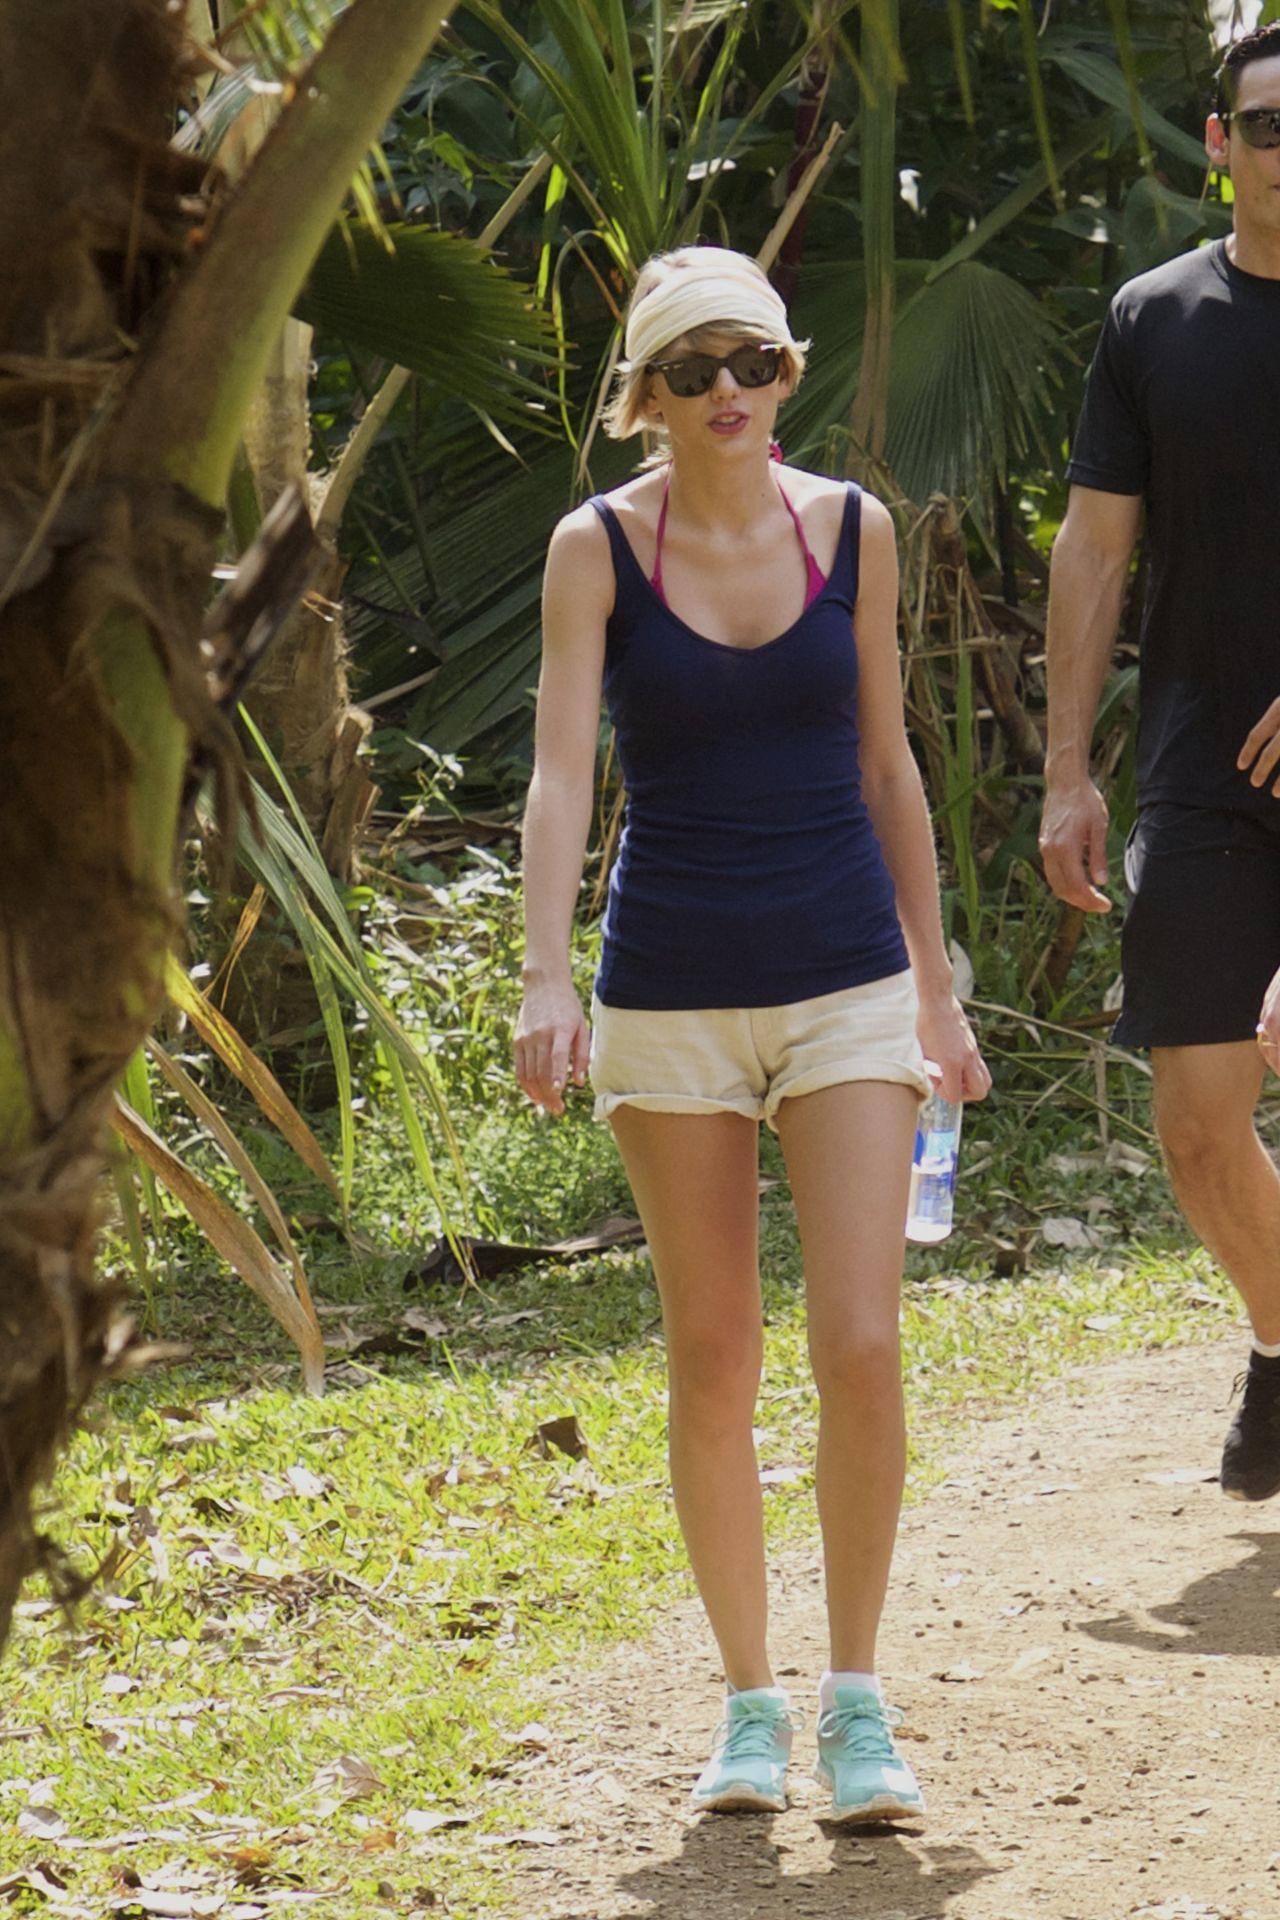 Taylor Swift in Shorts - Hiking in Hawaii, January 2015